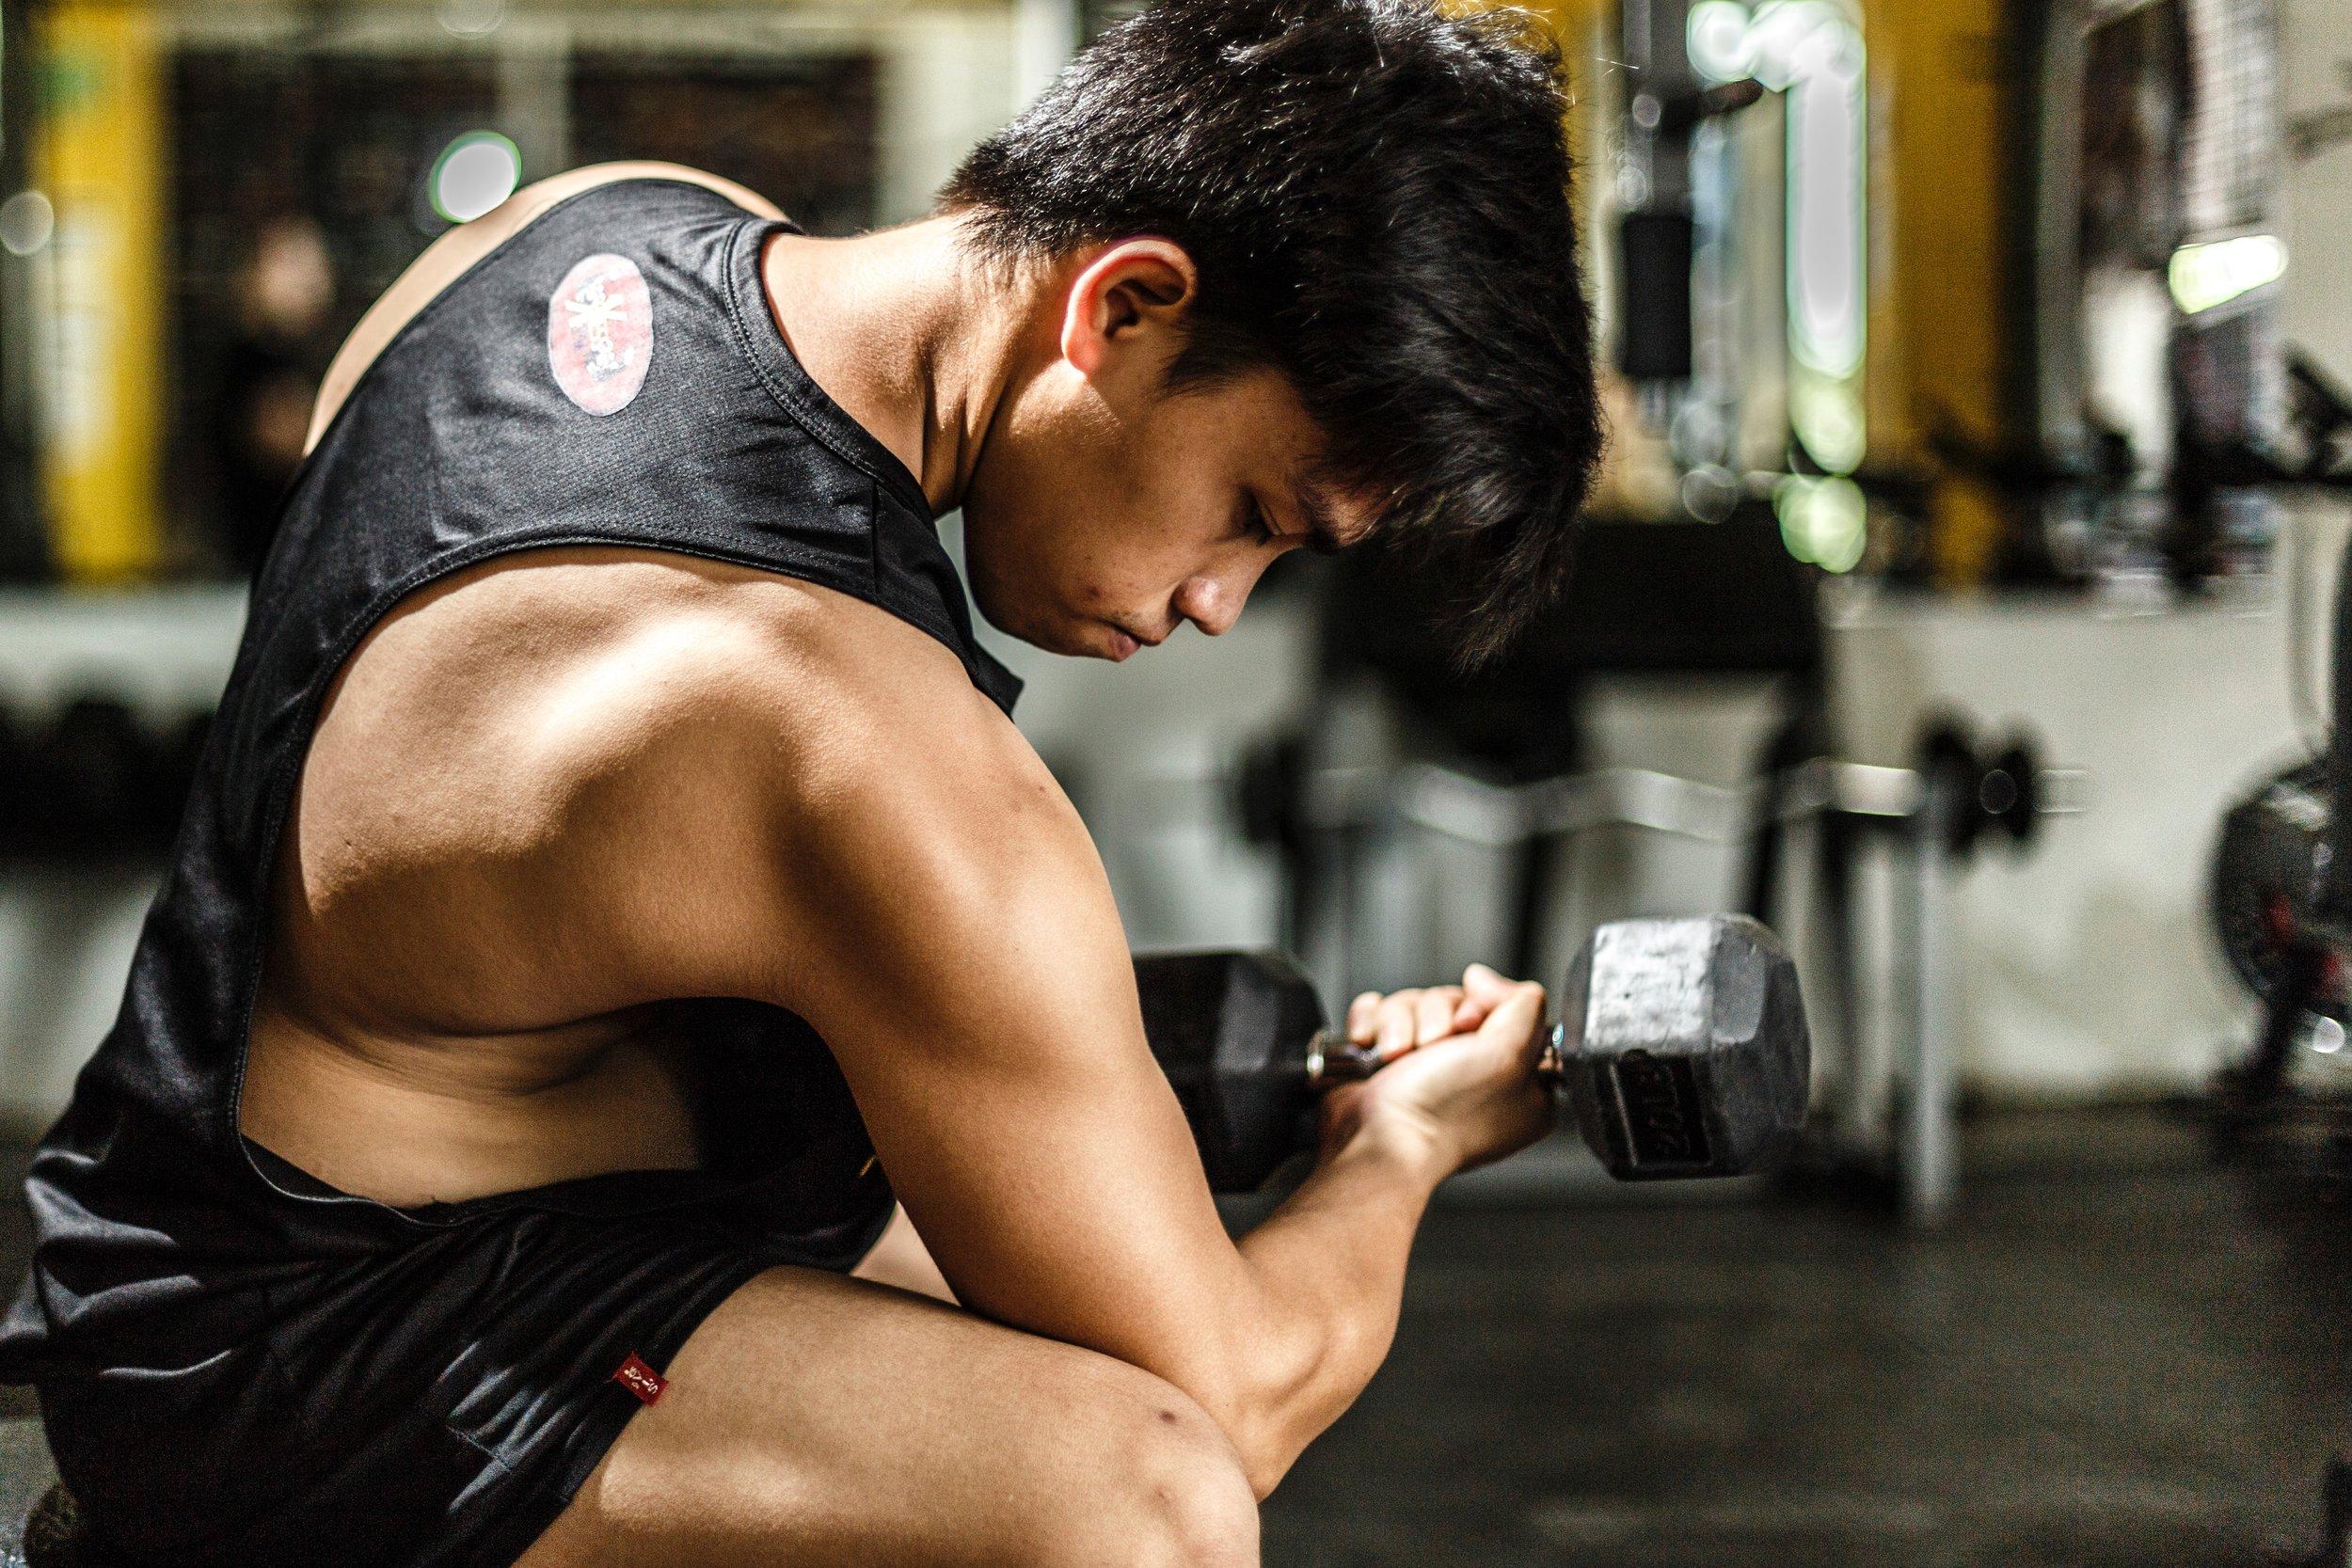 athlete-barbell-blurred-background-700446.jpg